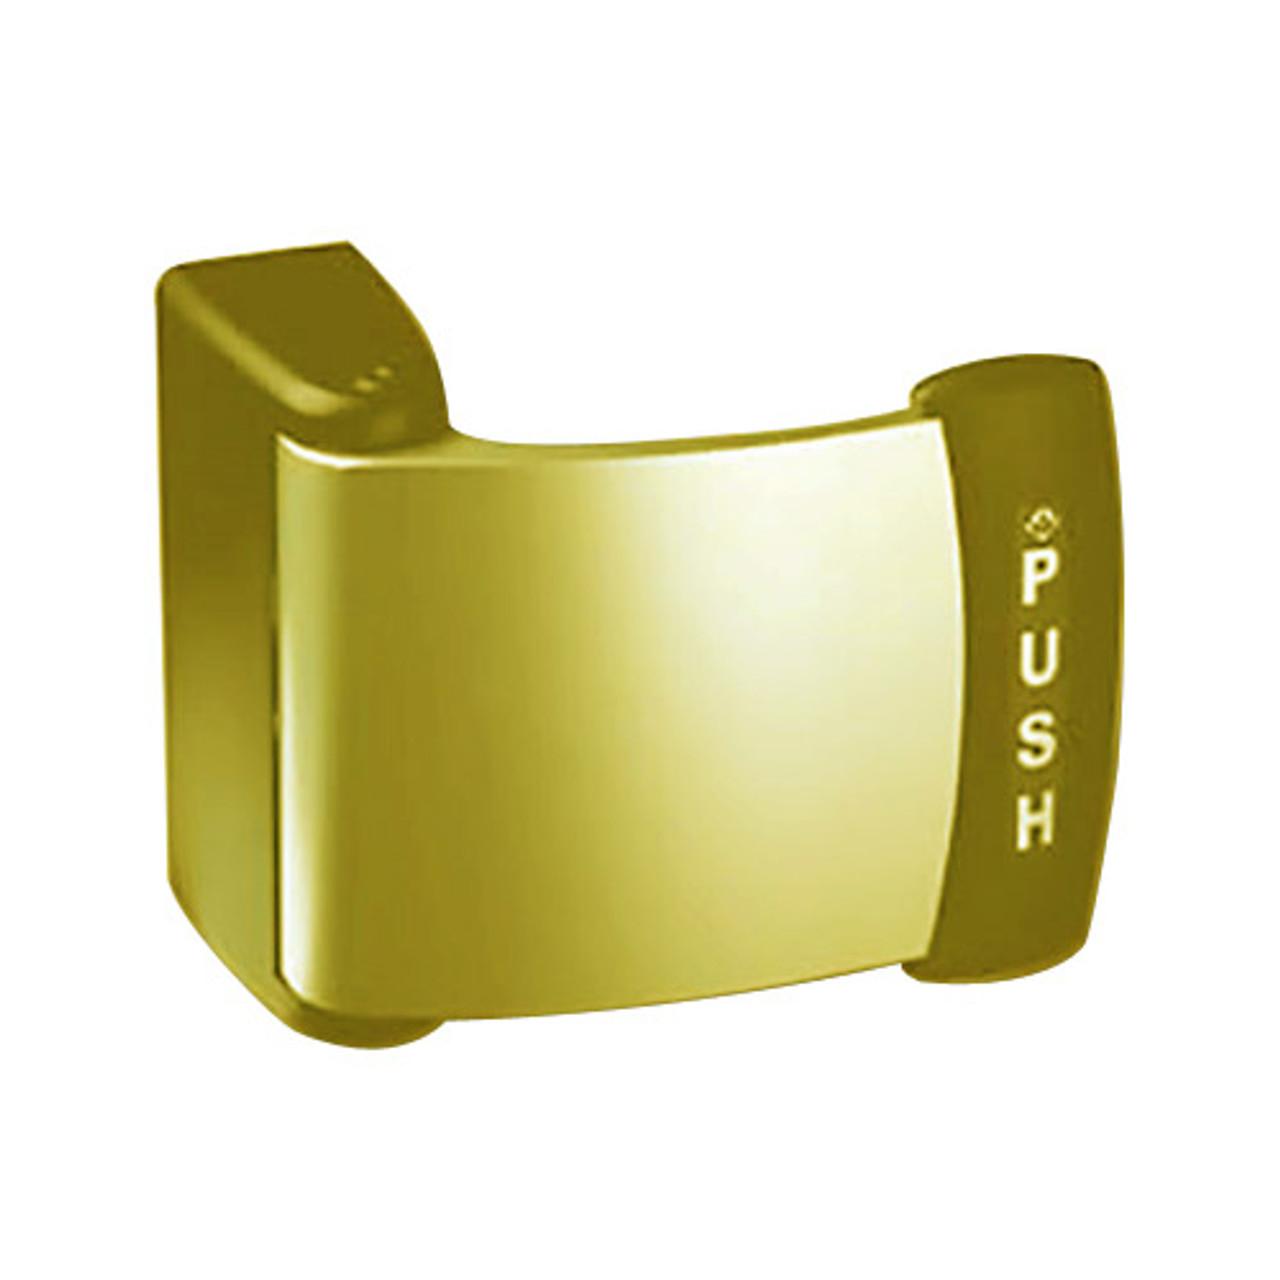 4591M-14-03-US3 Adams Rite Deadlatch Paddle in Bright Brass Finish